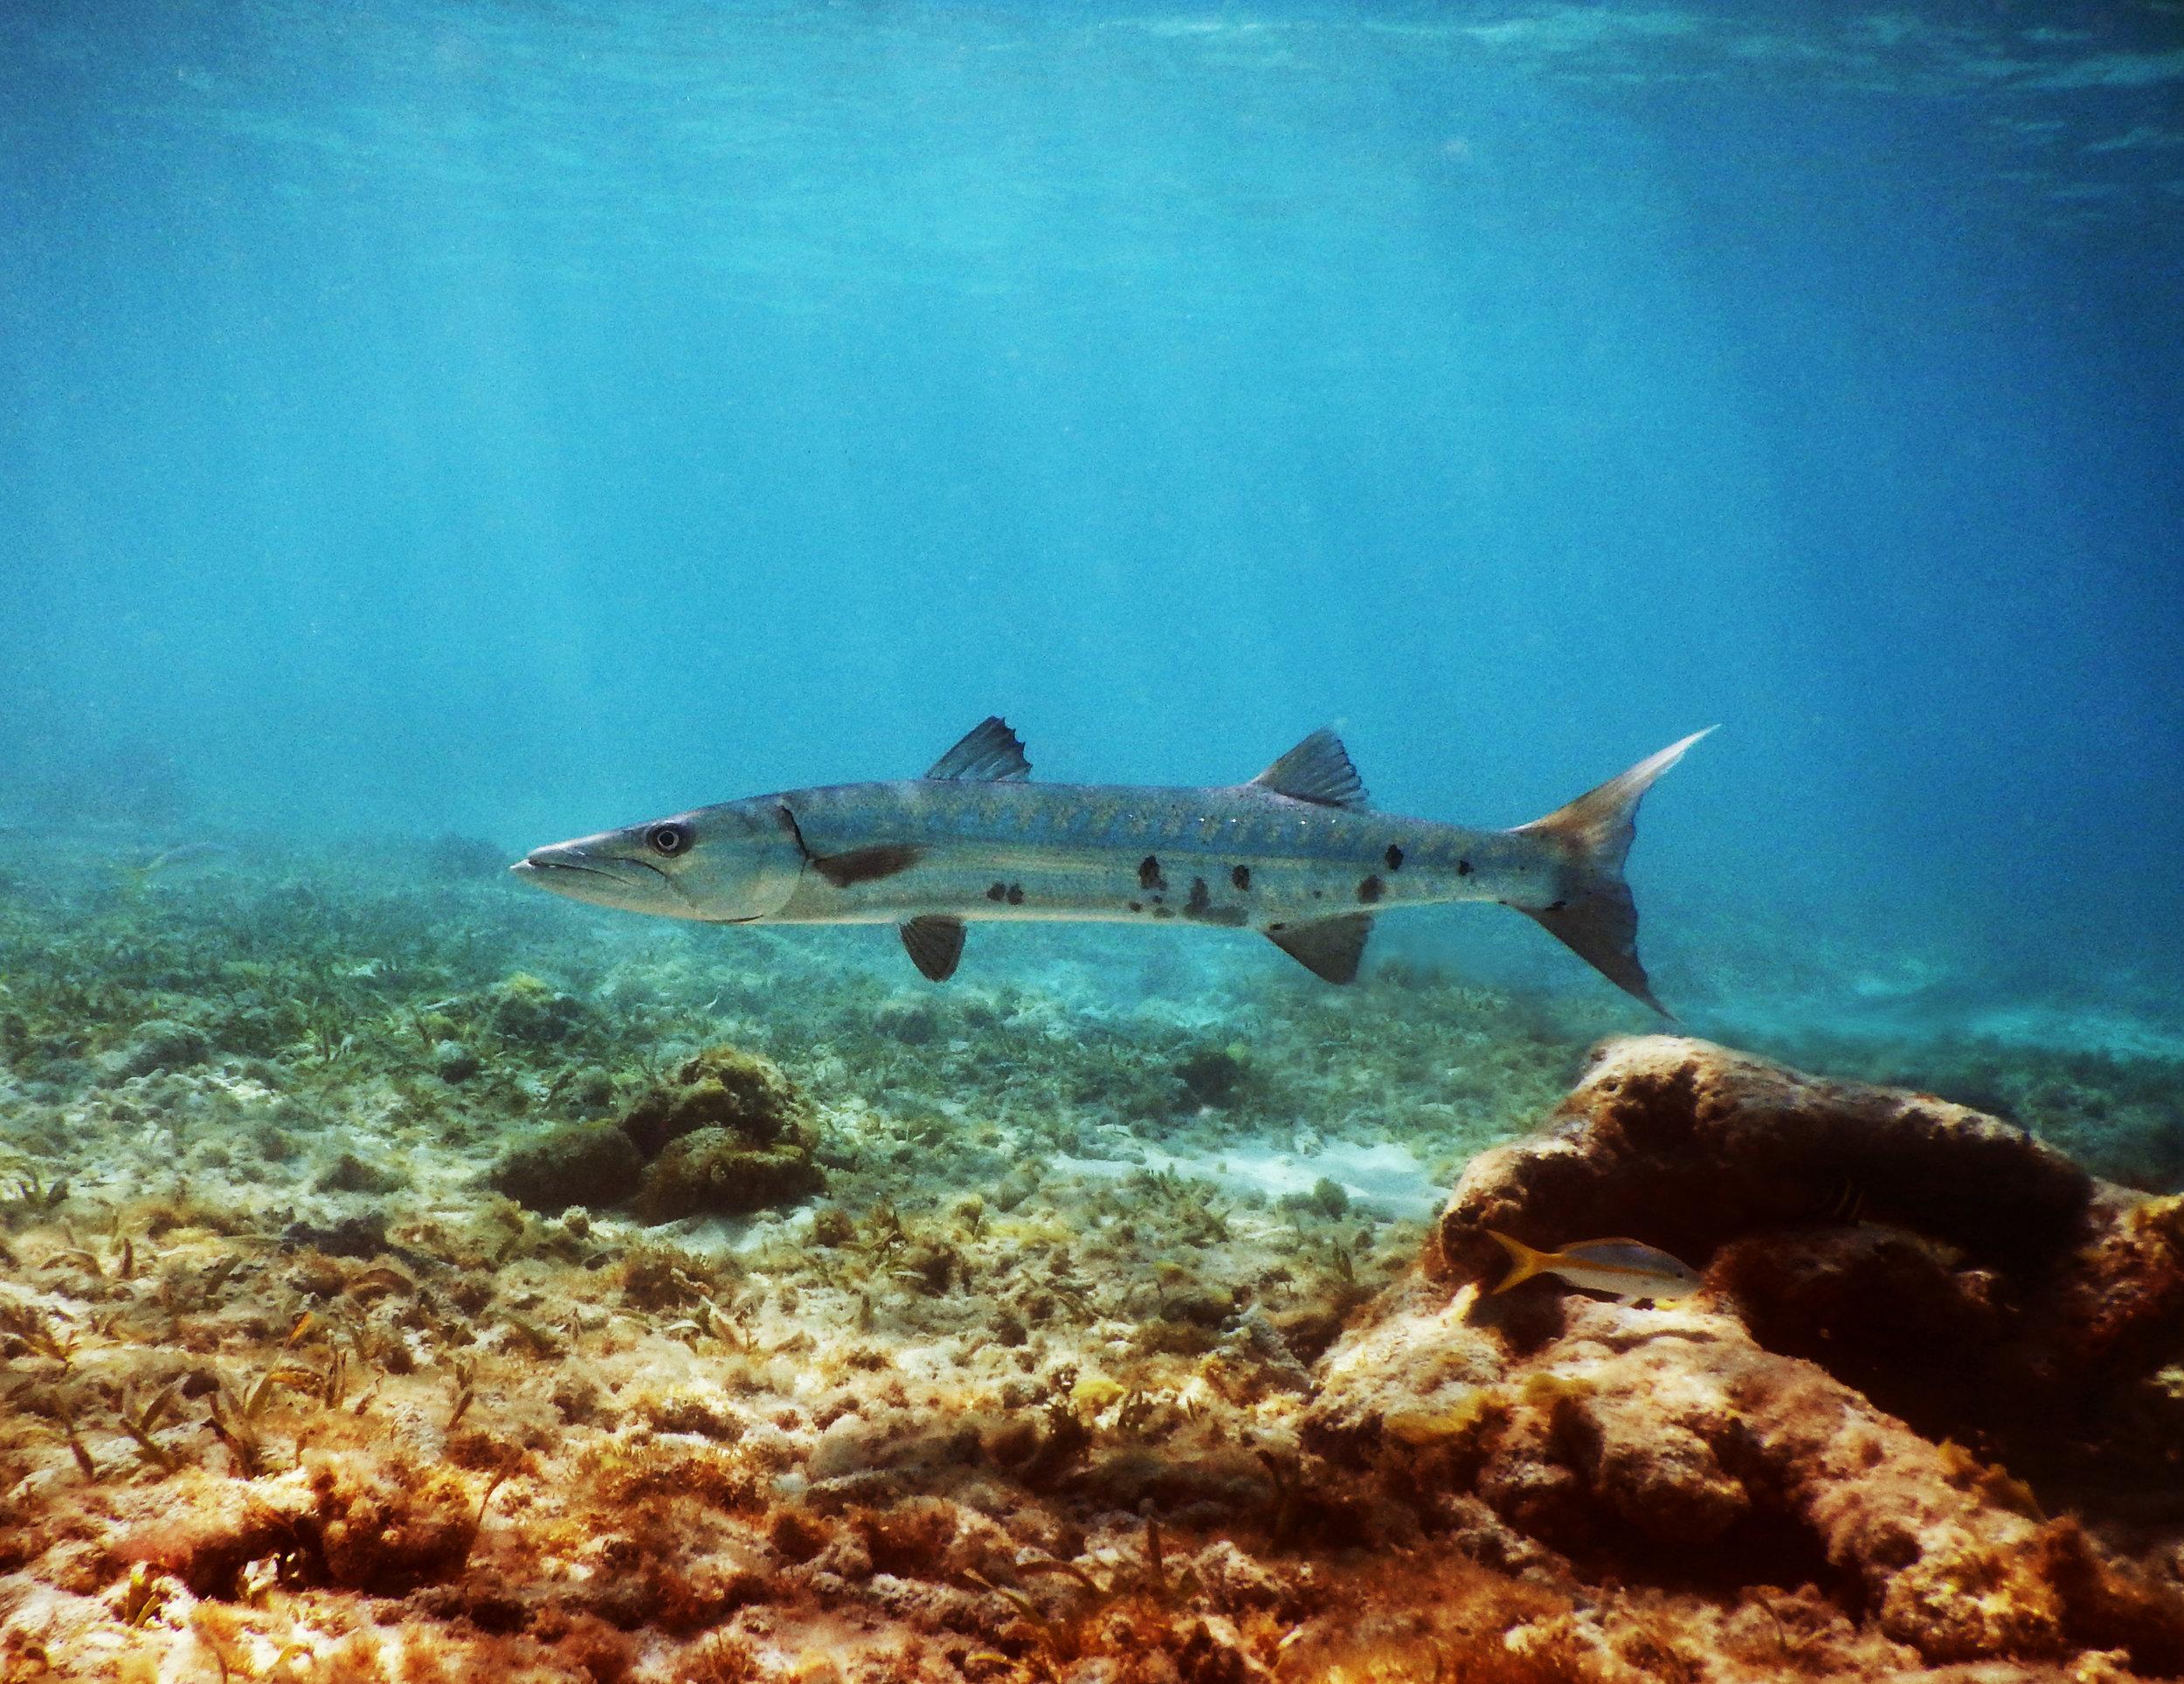 A barracuda lurks in John Pennekamp Coral Reef State Park.